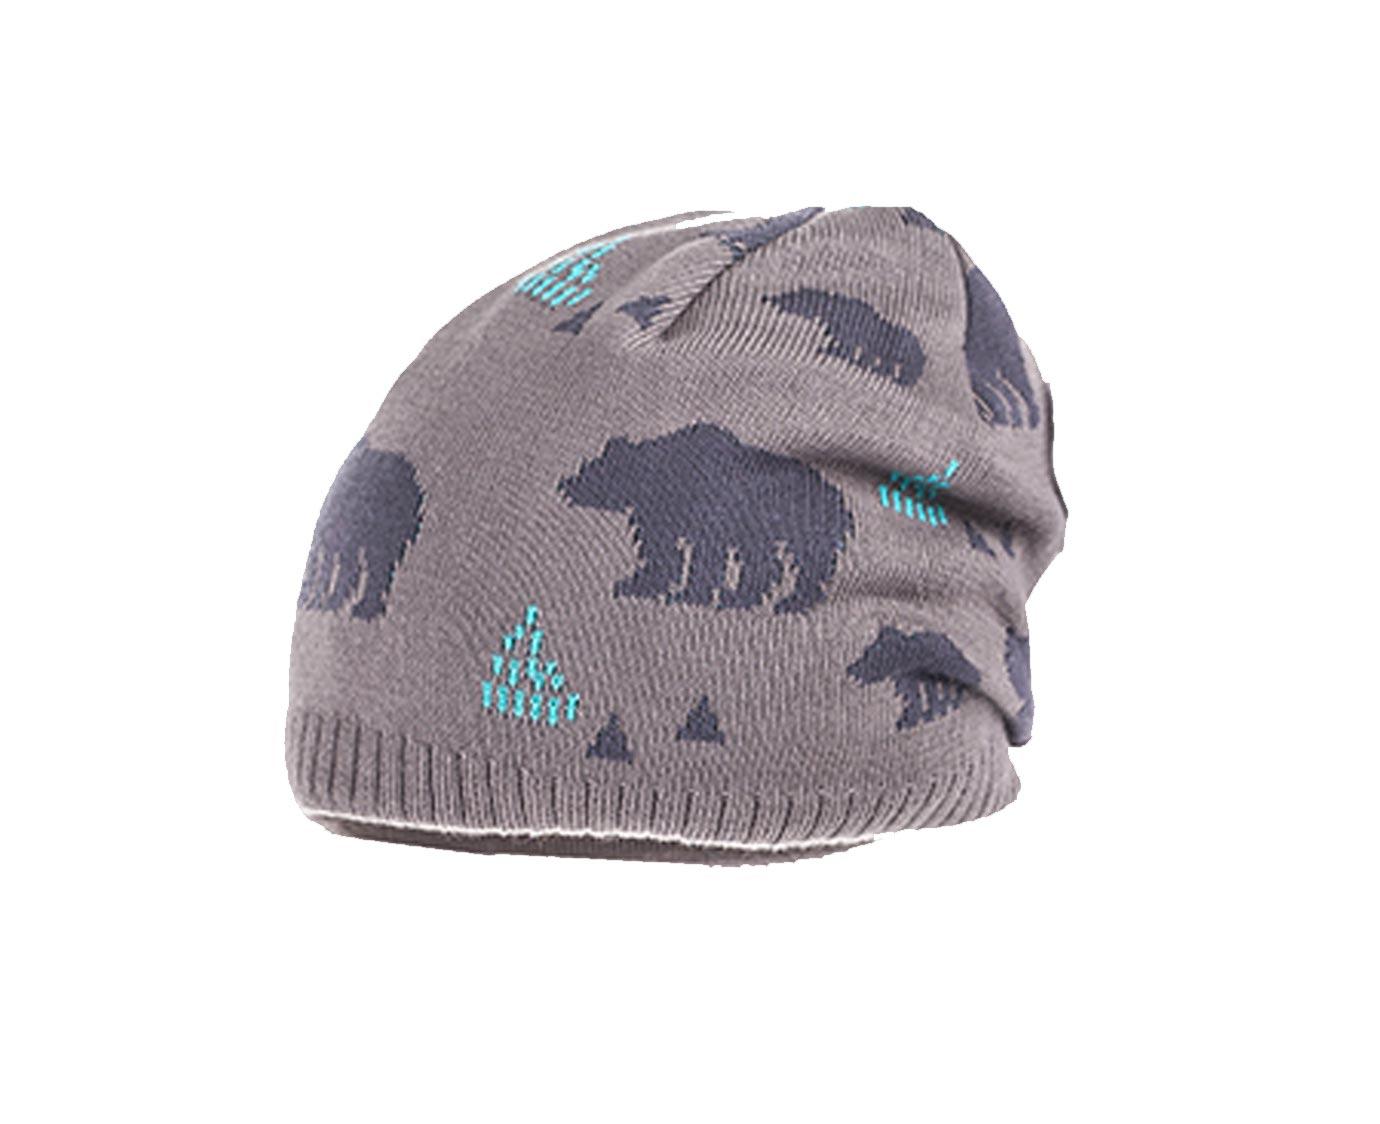 Kindermuts 'Winter bear' 4-8 jaar